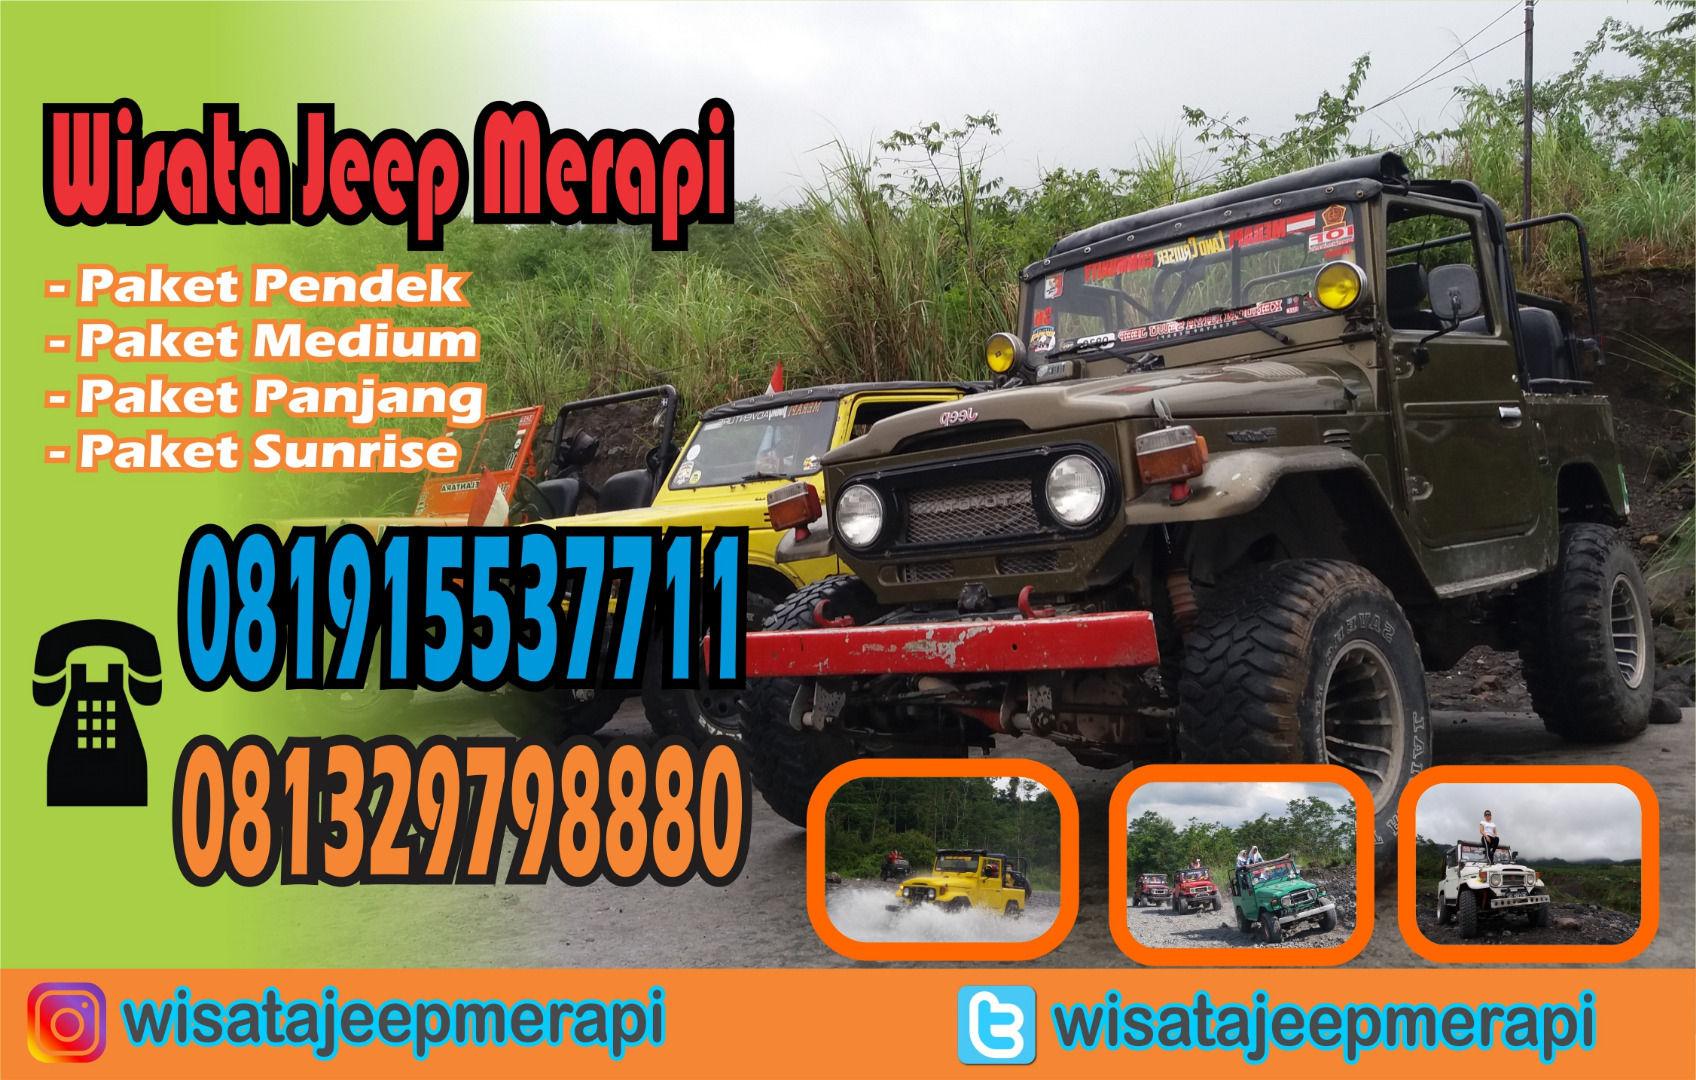 Paket Lava Tour Merapi Jogja Sewa Jeep Wisata Merapi Yogyakarta Jualo